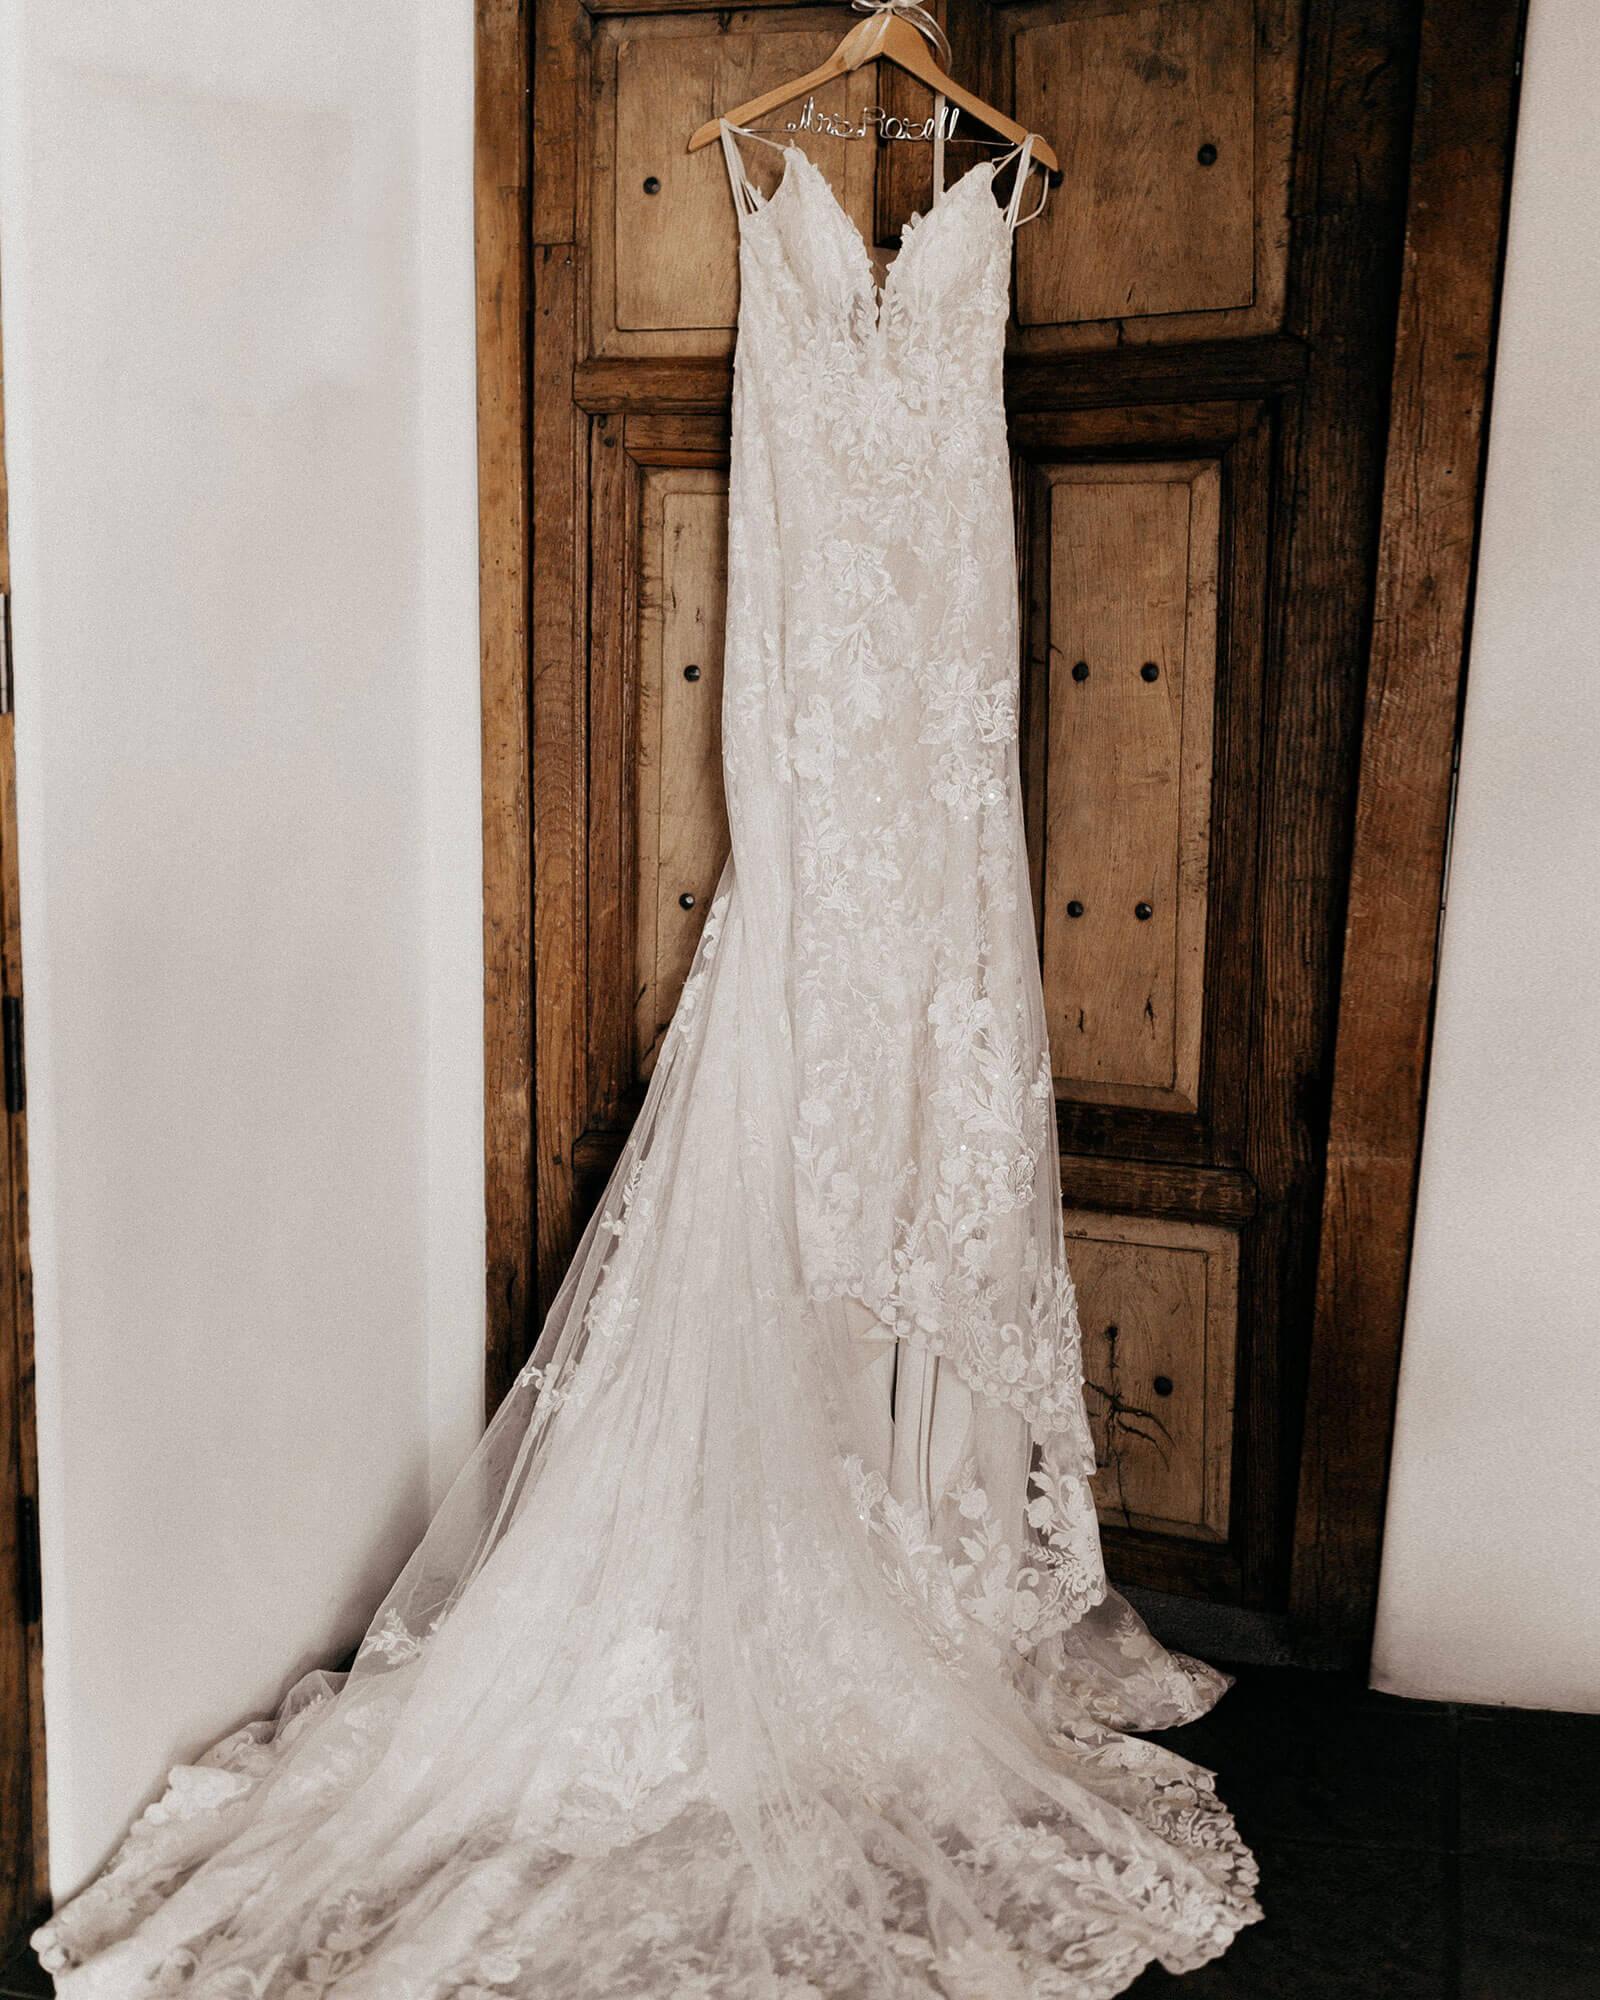 Stunning Mermaid Wedding Dress